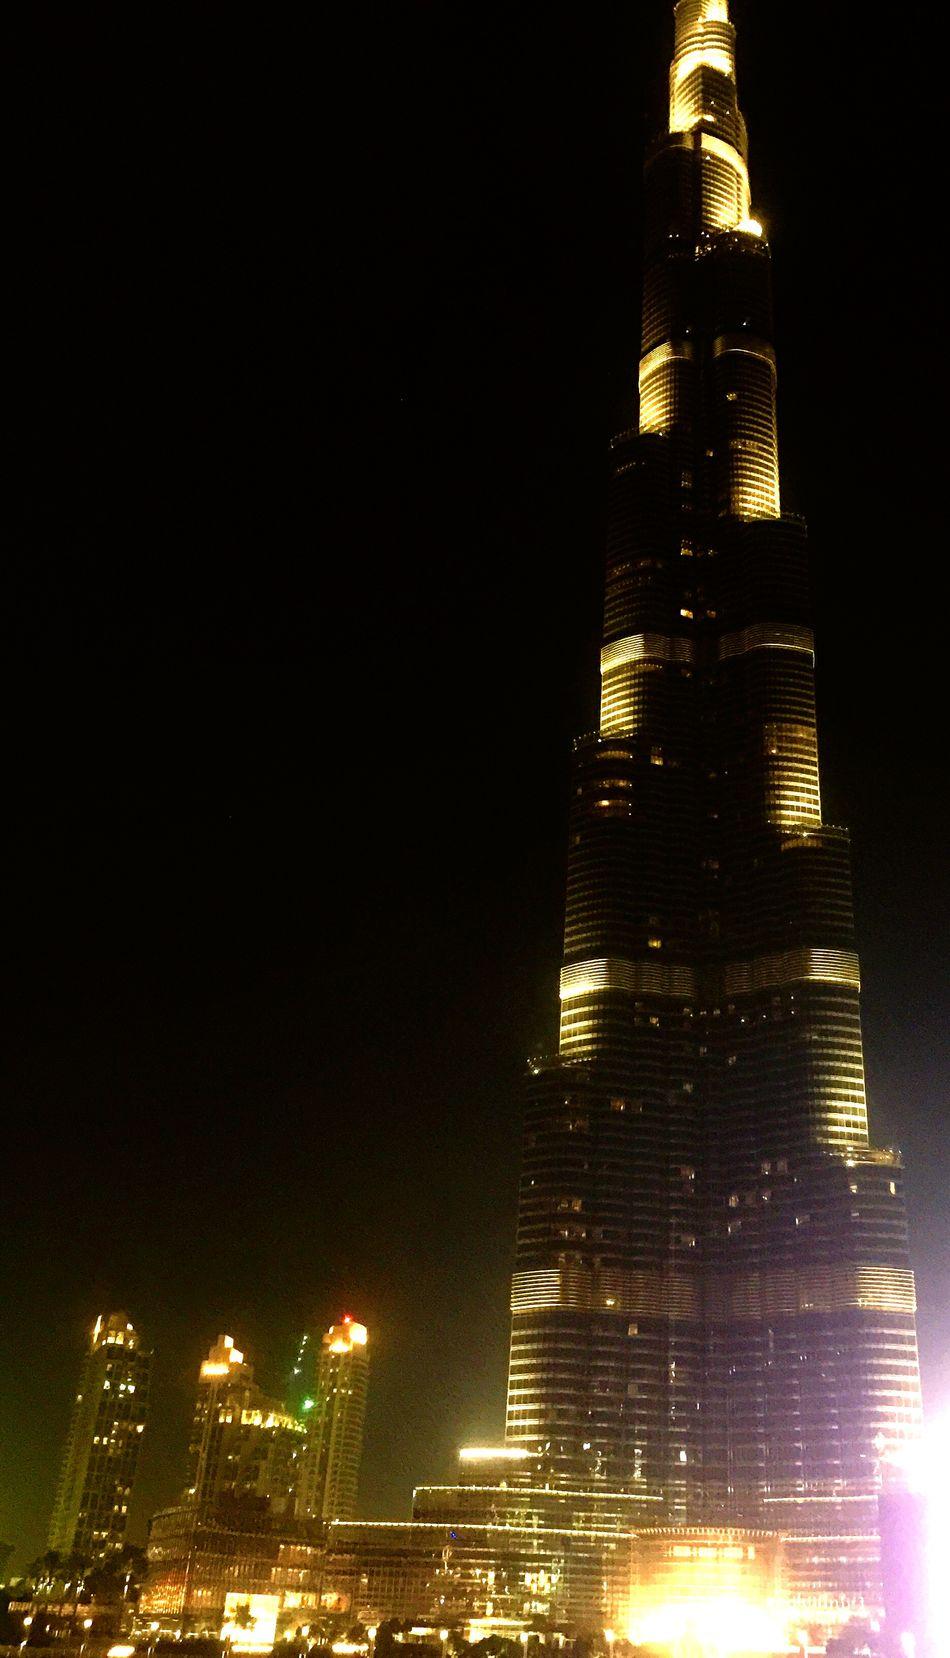 Bruj Al Arab Burj Khakifa Tollest Building Uae #dubai #sharjah #ajman #rak #fujairah #alain #abudhabi #ummalquwain #instagood #instamood #instalike #mydubai #myuae #dubaigems #emirates #dxb #myabudhabi #shj #insharjah #qatar Oman Bahrain Kuwait Ksa [ Architecture_collection Nightlife Night Lights The Architect - 2015 EyeEm Awards